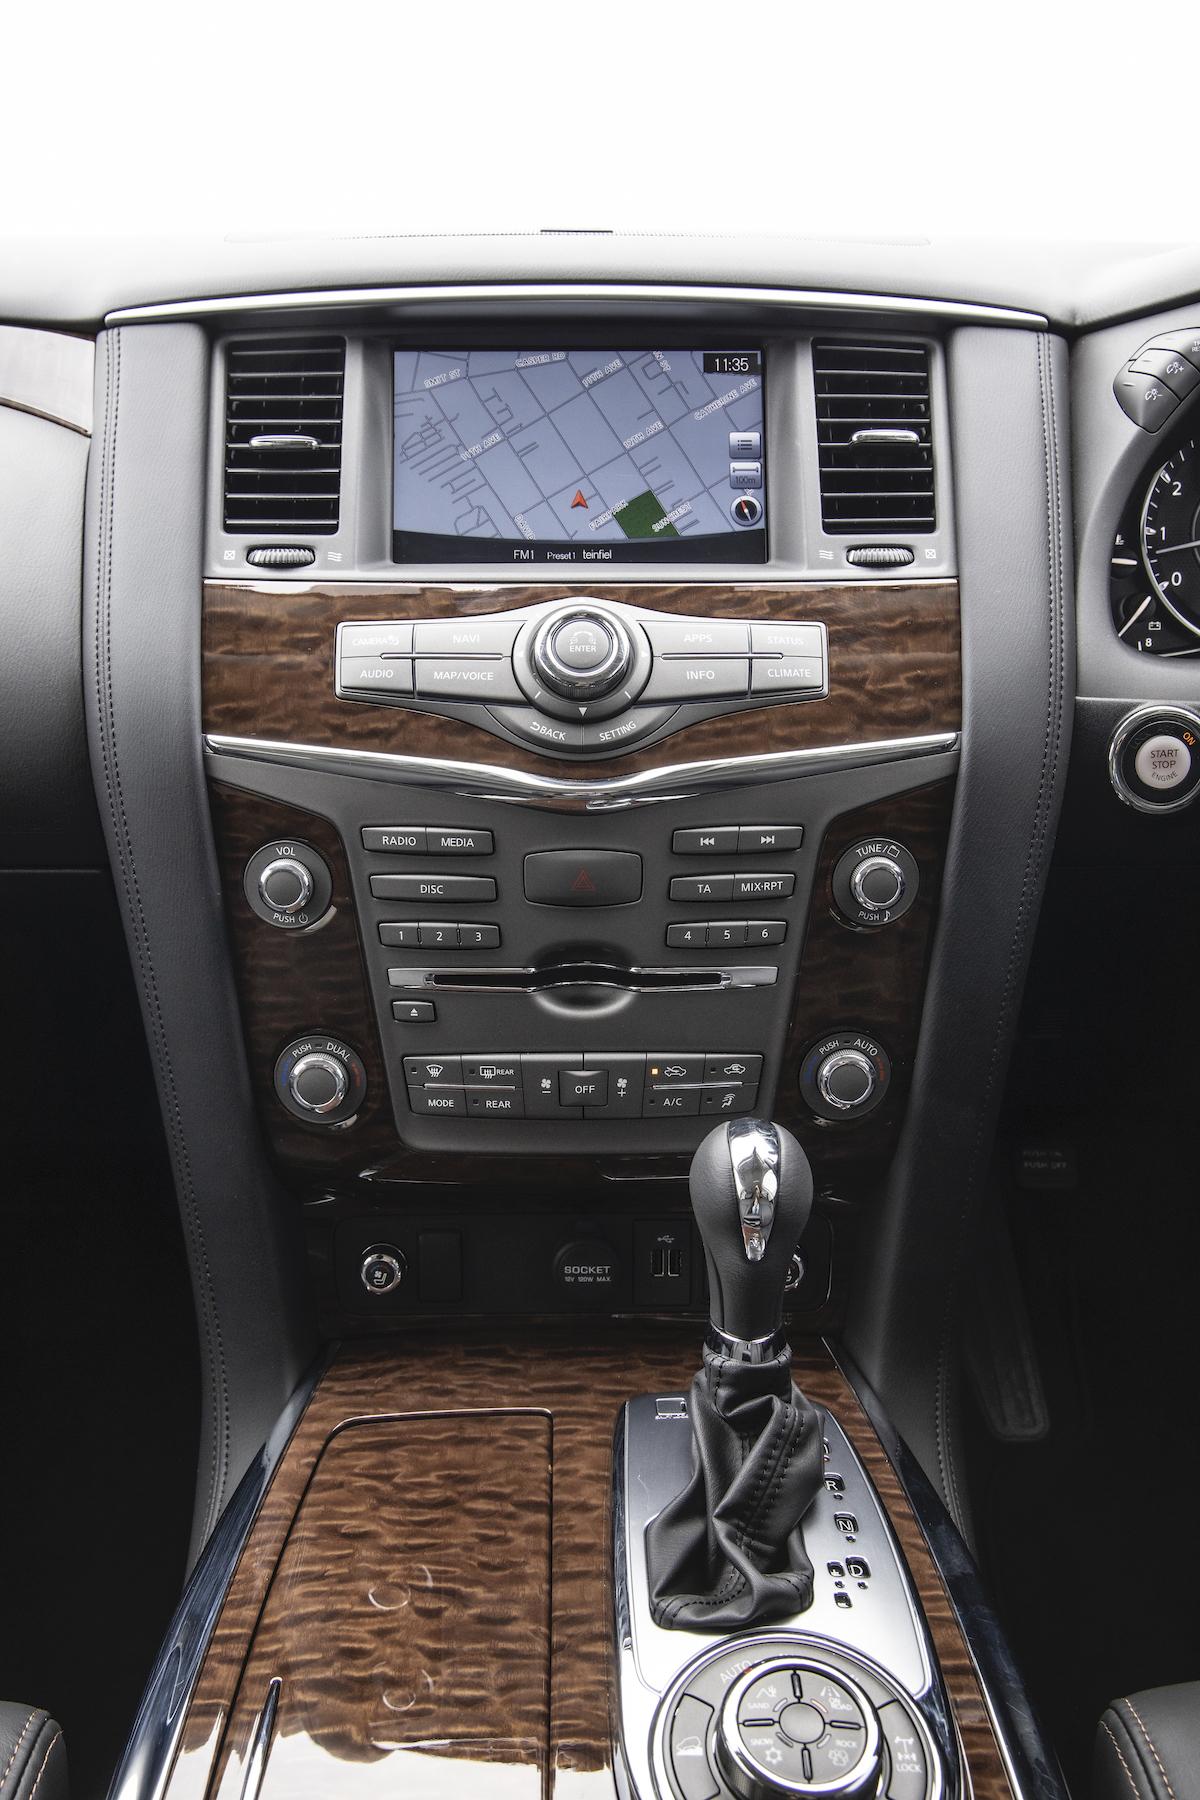 Nissan Patrol 2020 South Africa - image 19.jpg